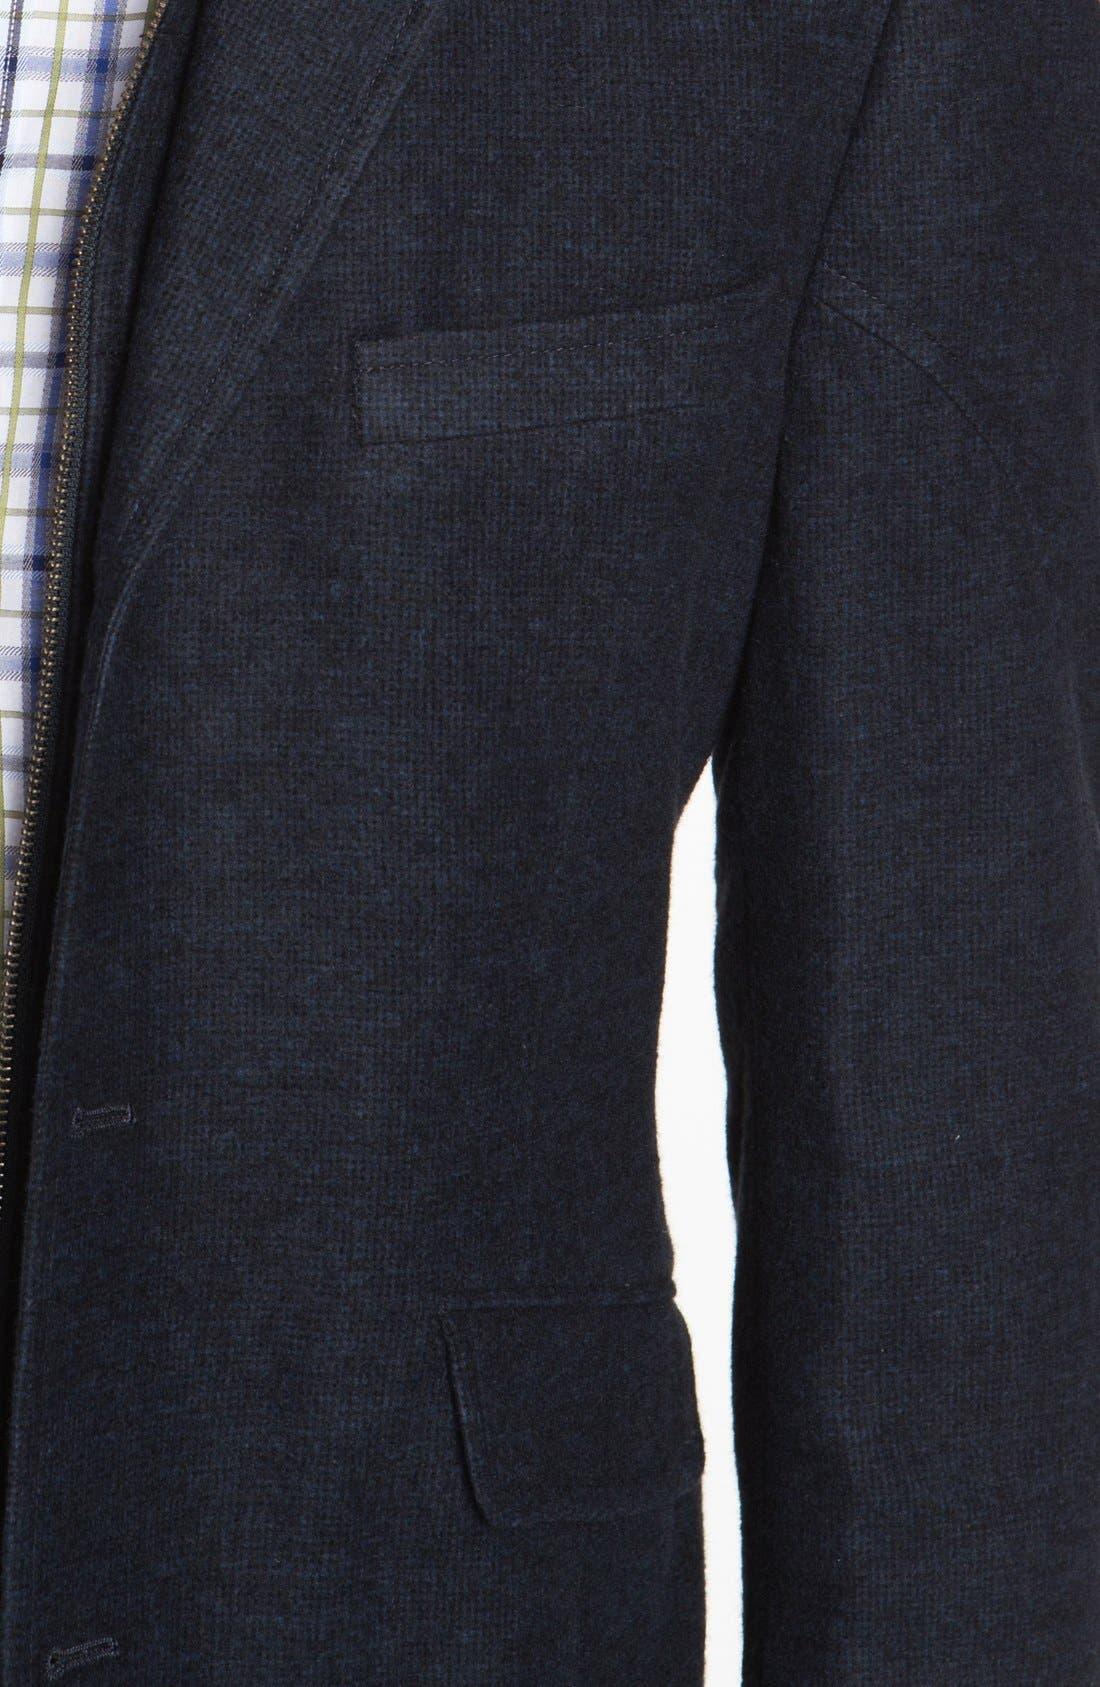 Alternate Image 3  - Kroon 'Ritchie' Sportcoat